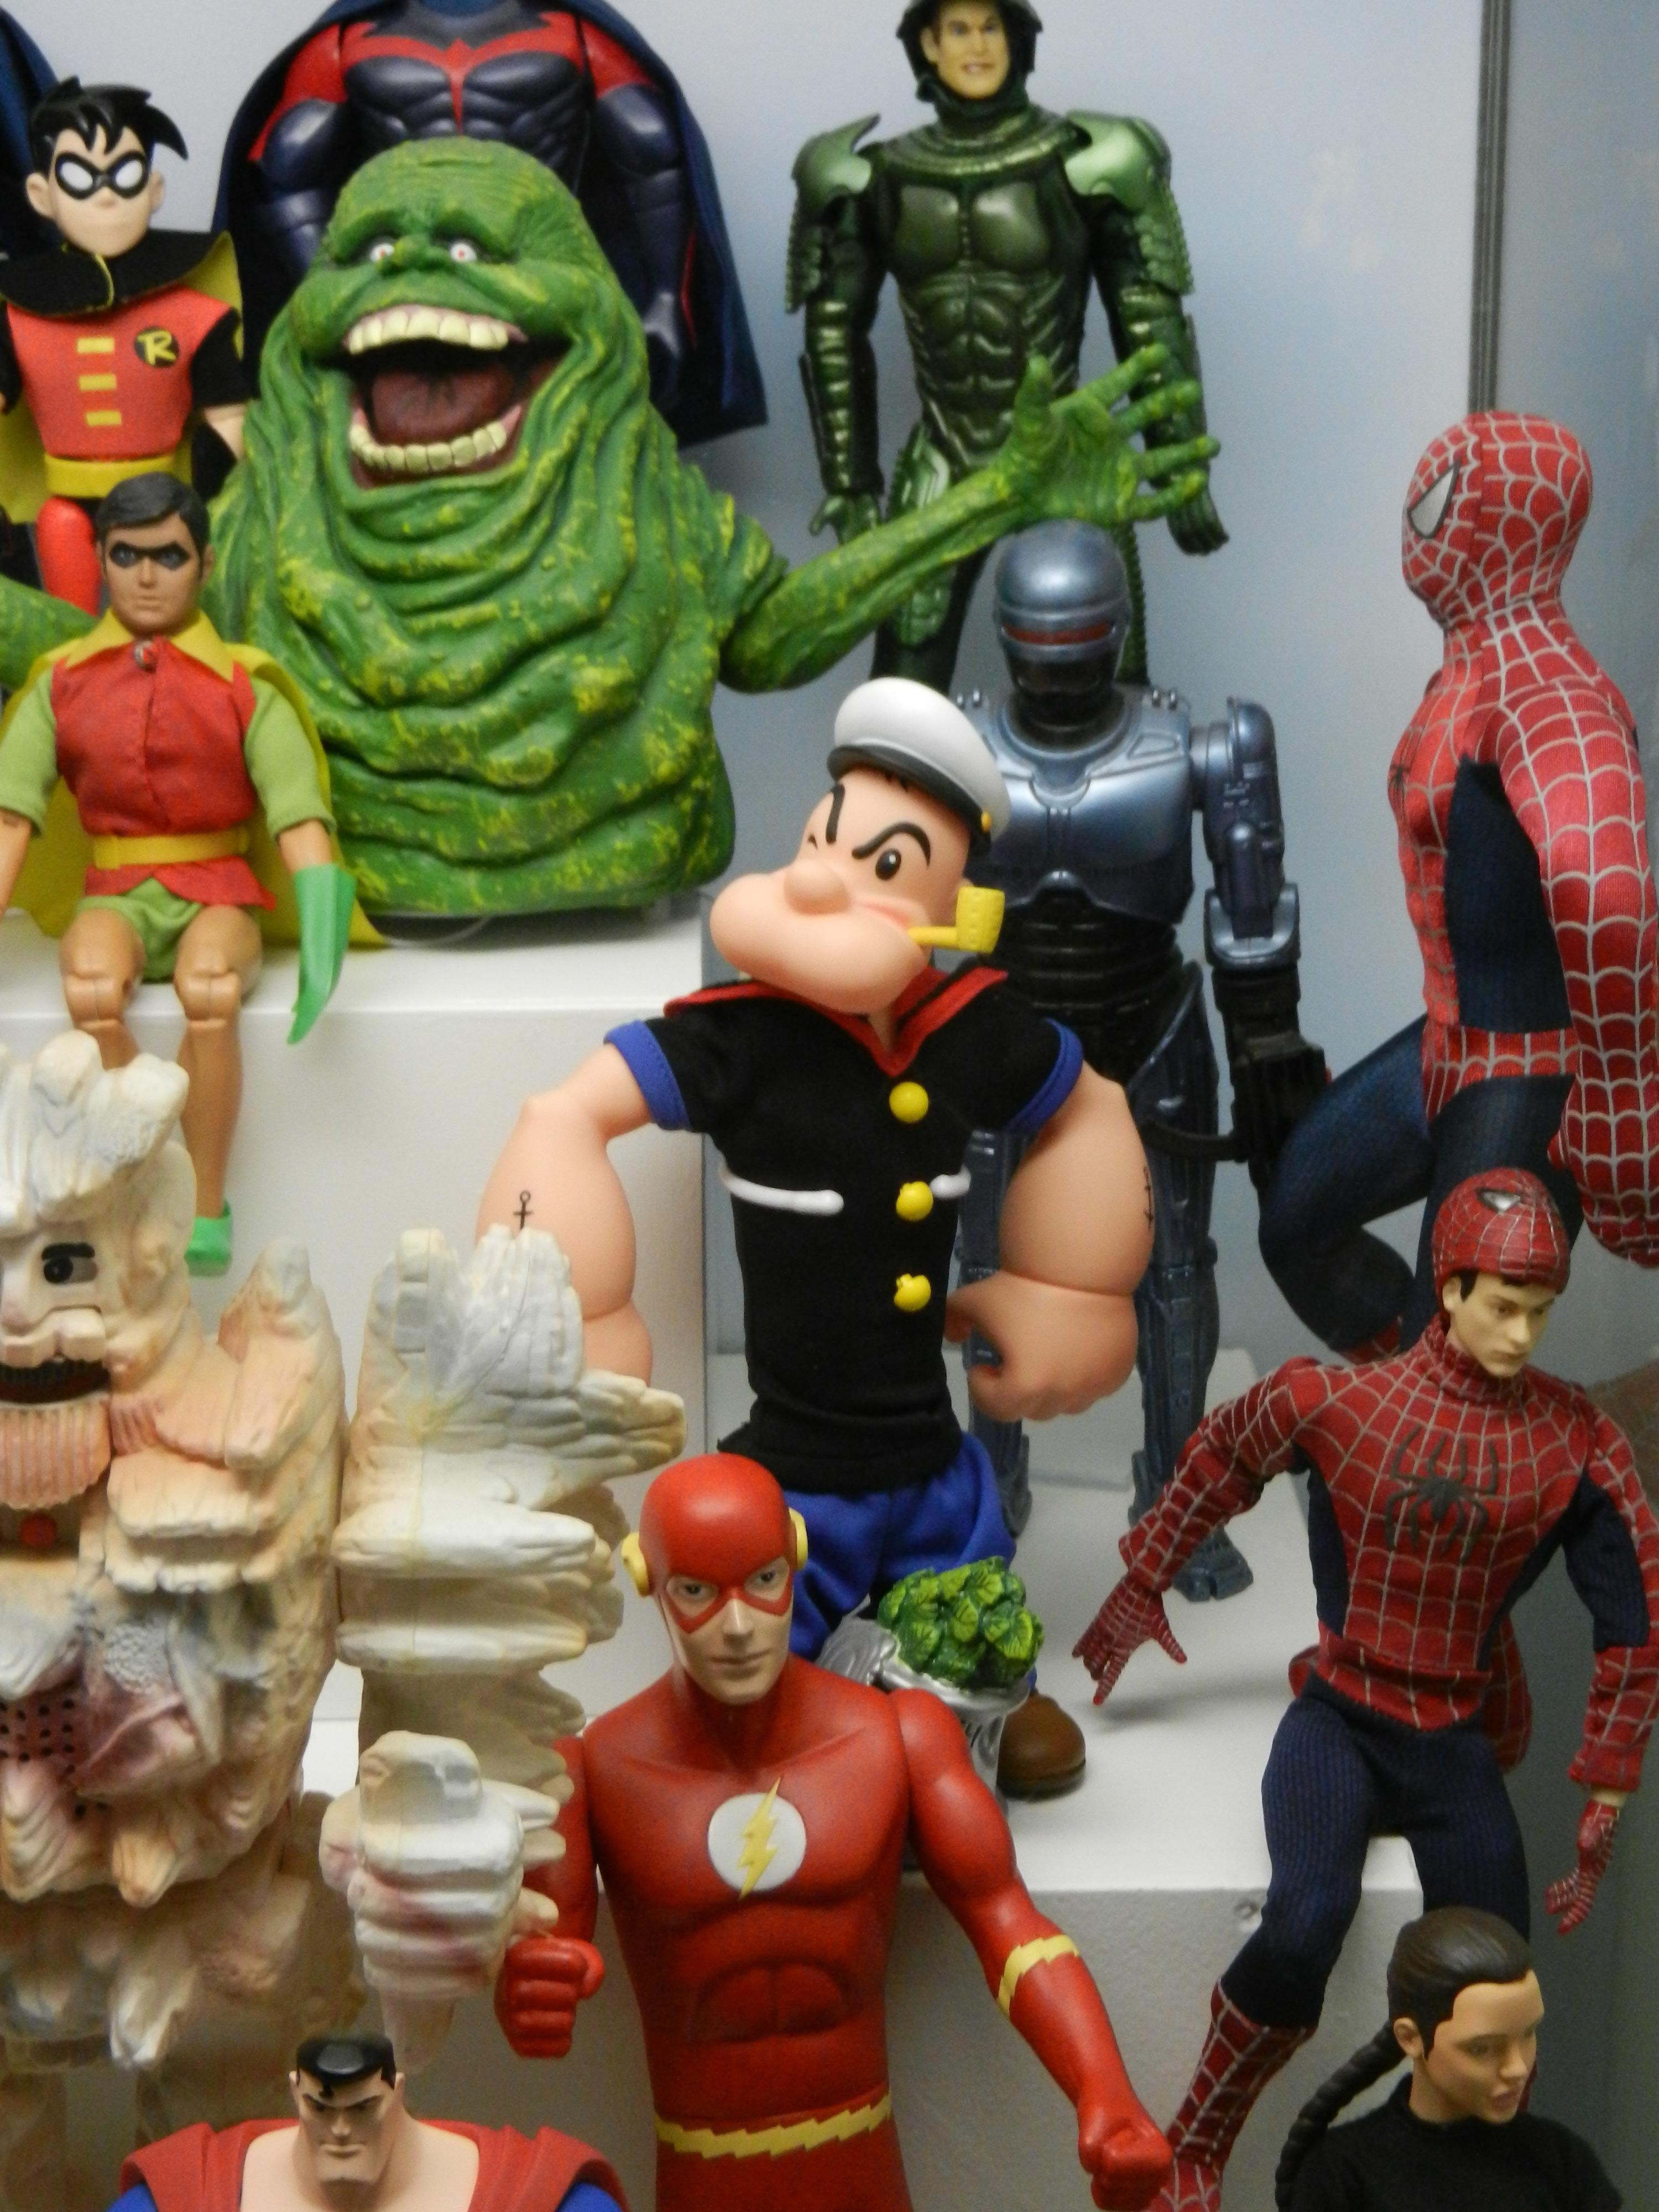 Gambar Mainan Batman Action Figure Patung Patung Komik